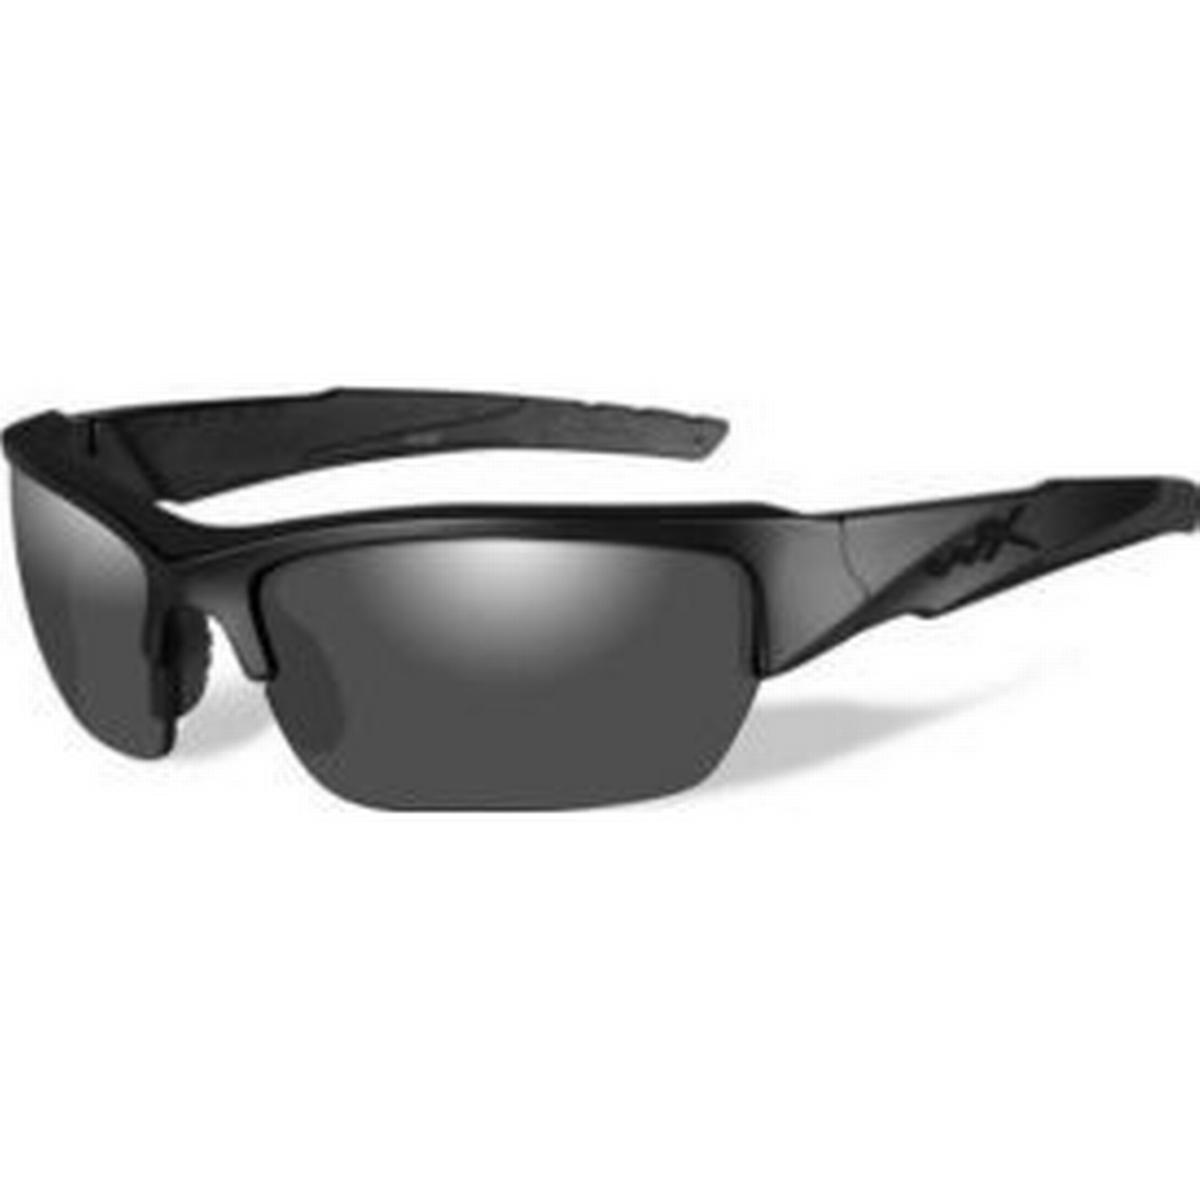 Wiley X Solglasögon (56 produkter) hos PriceRunner • Se